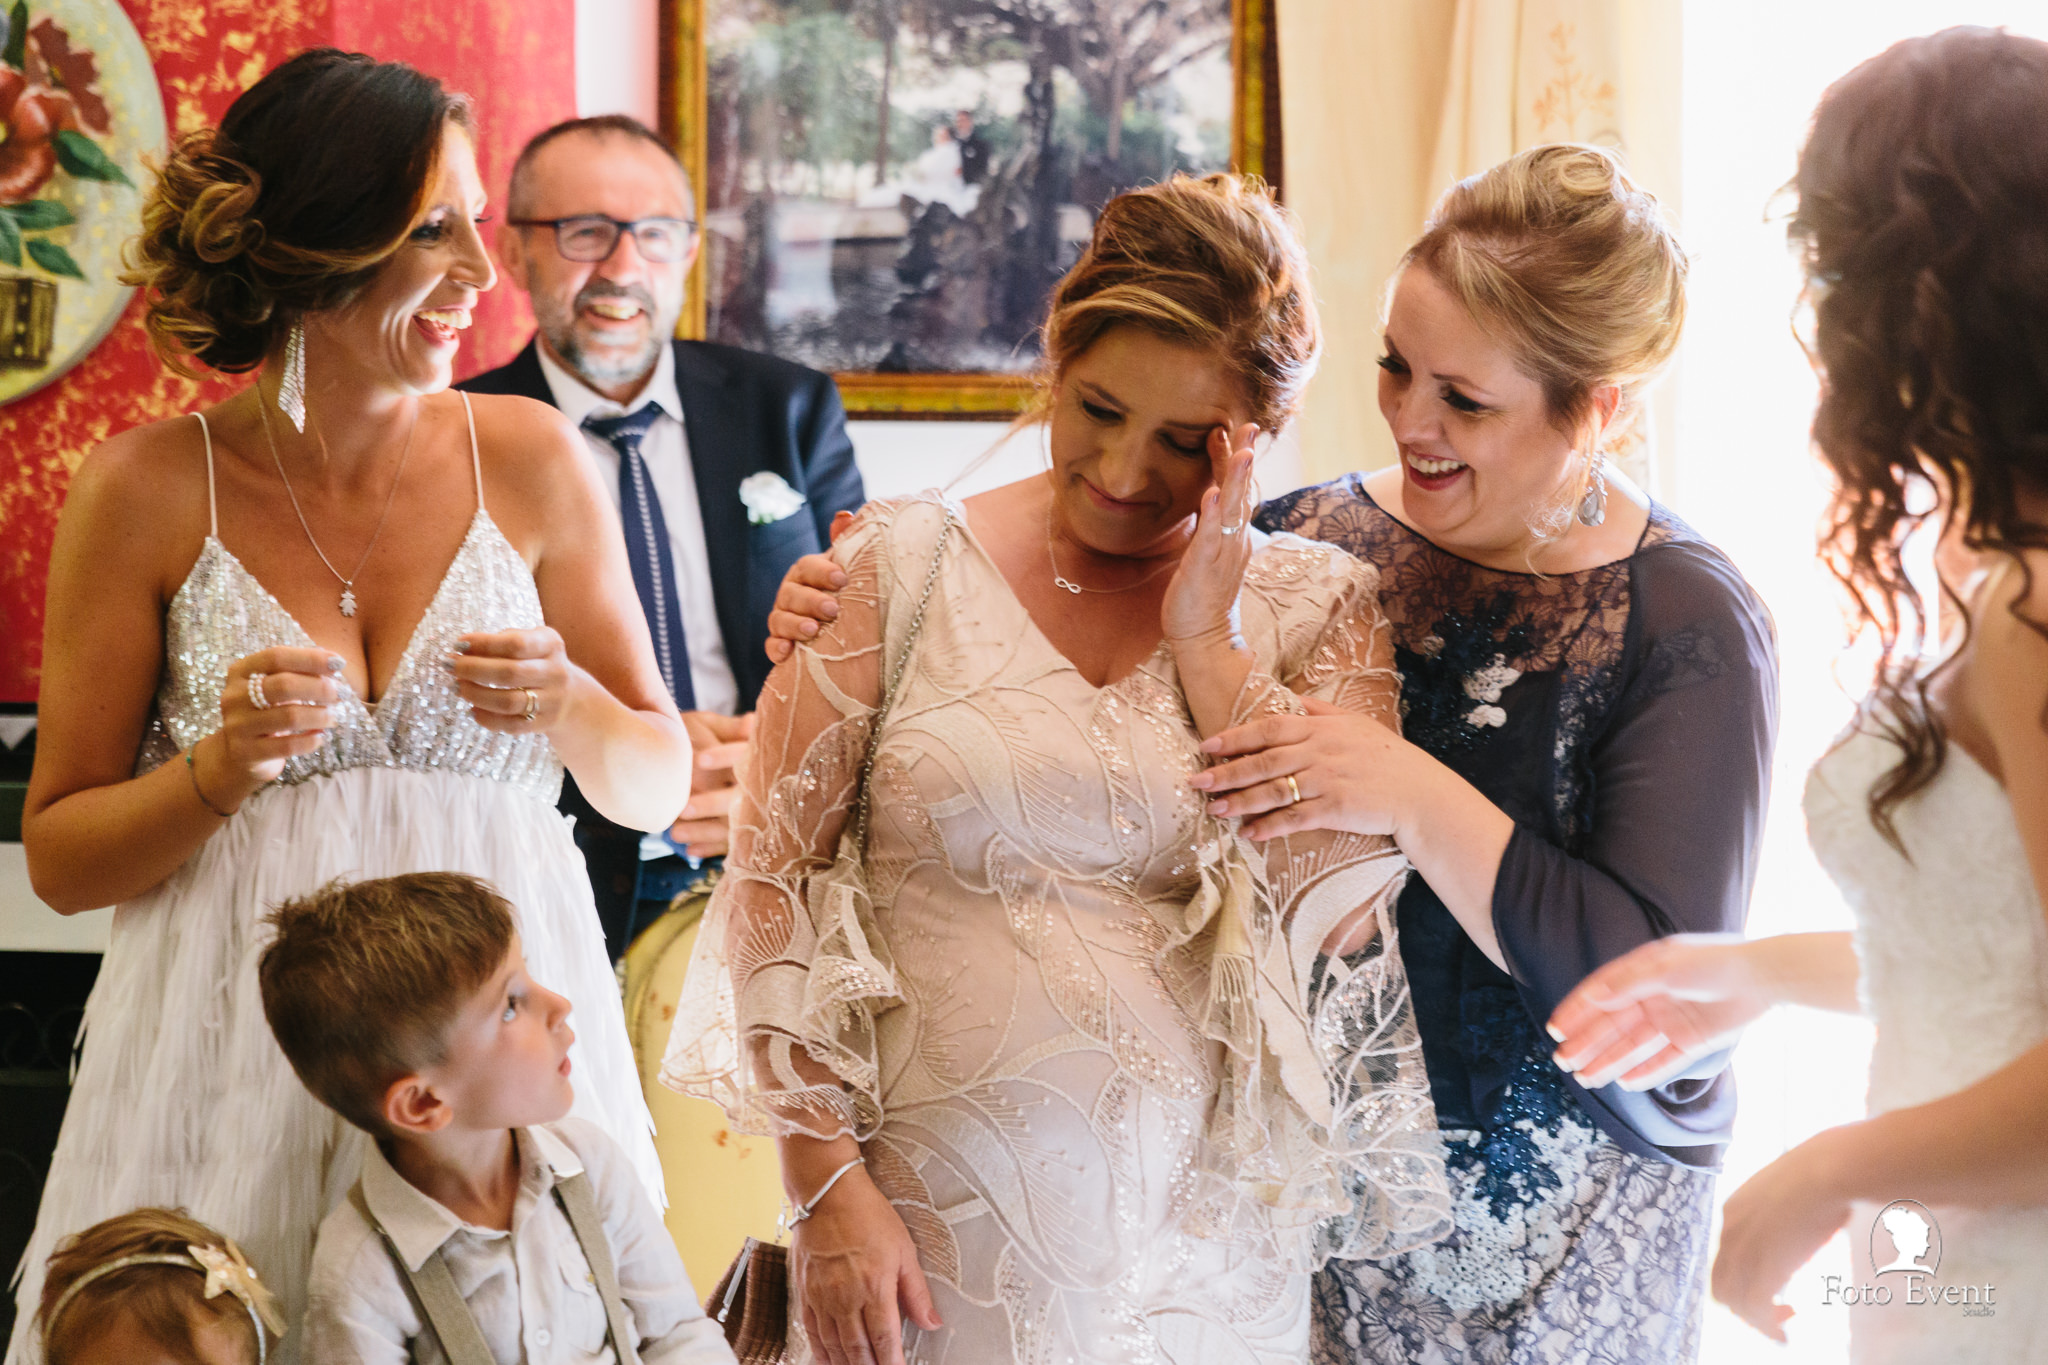 023-2019-08-31-Matrimonio-Serena-e-Saverio-Tarantino-5DE-783